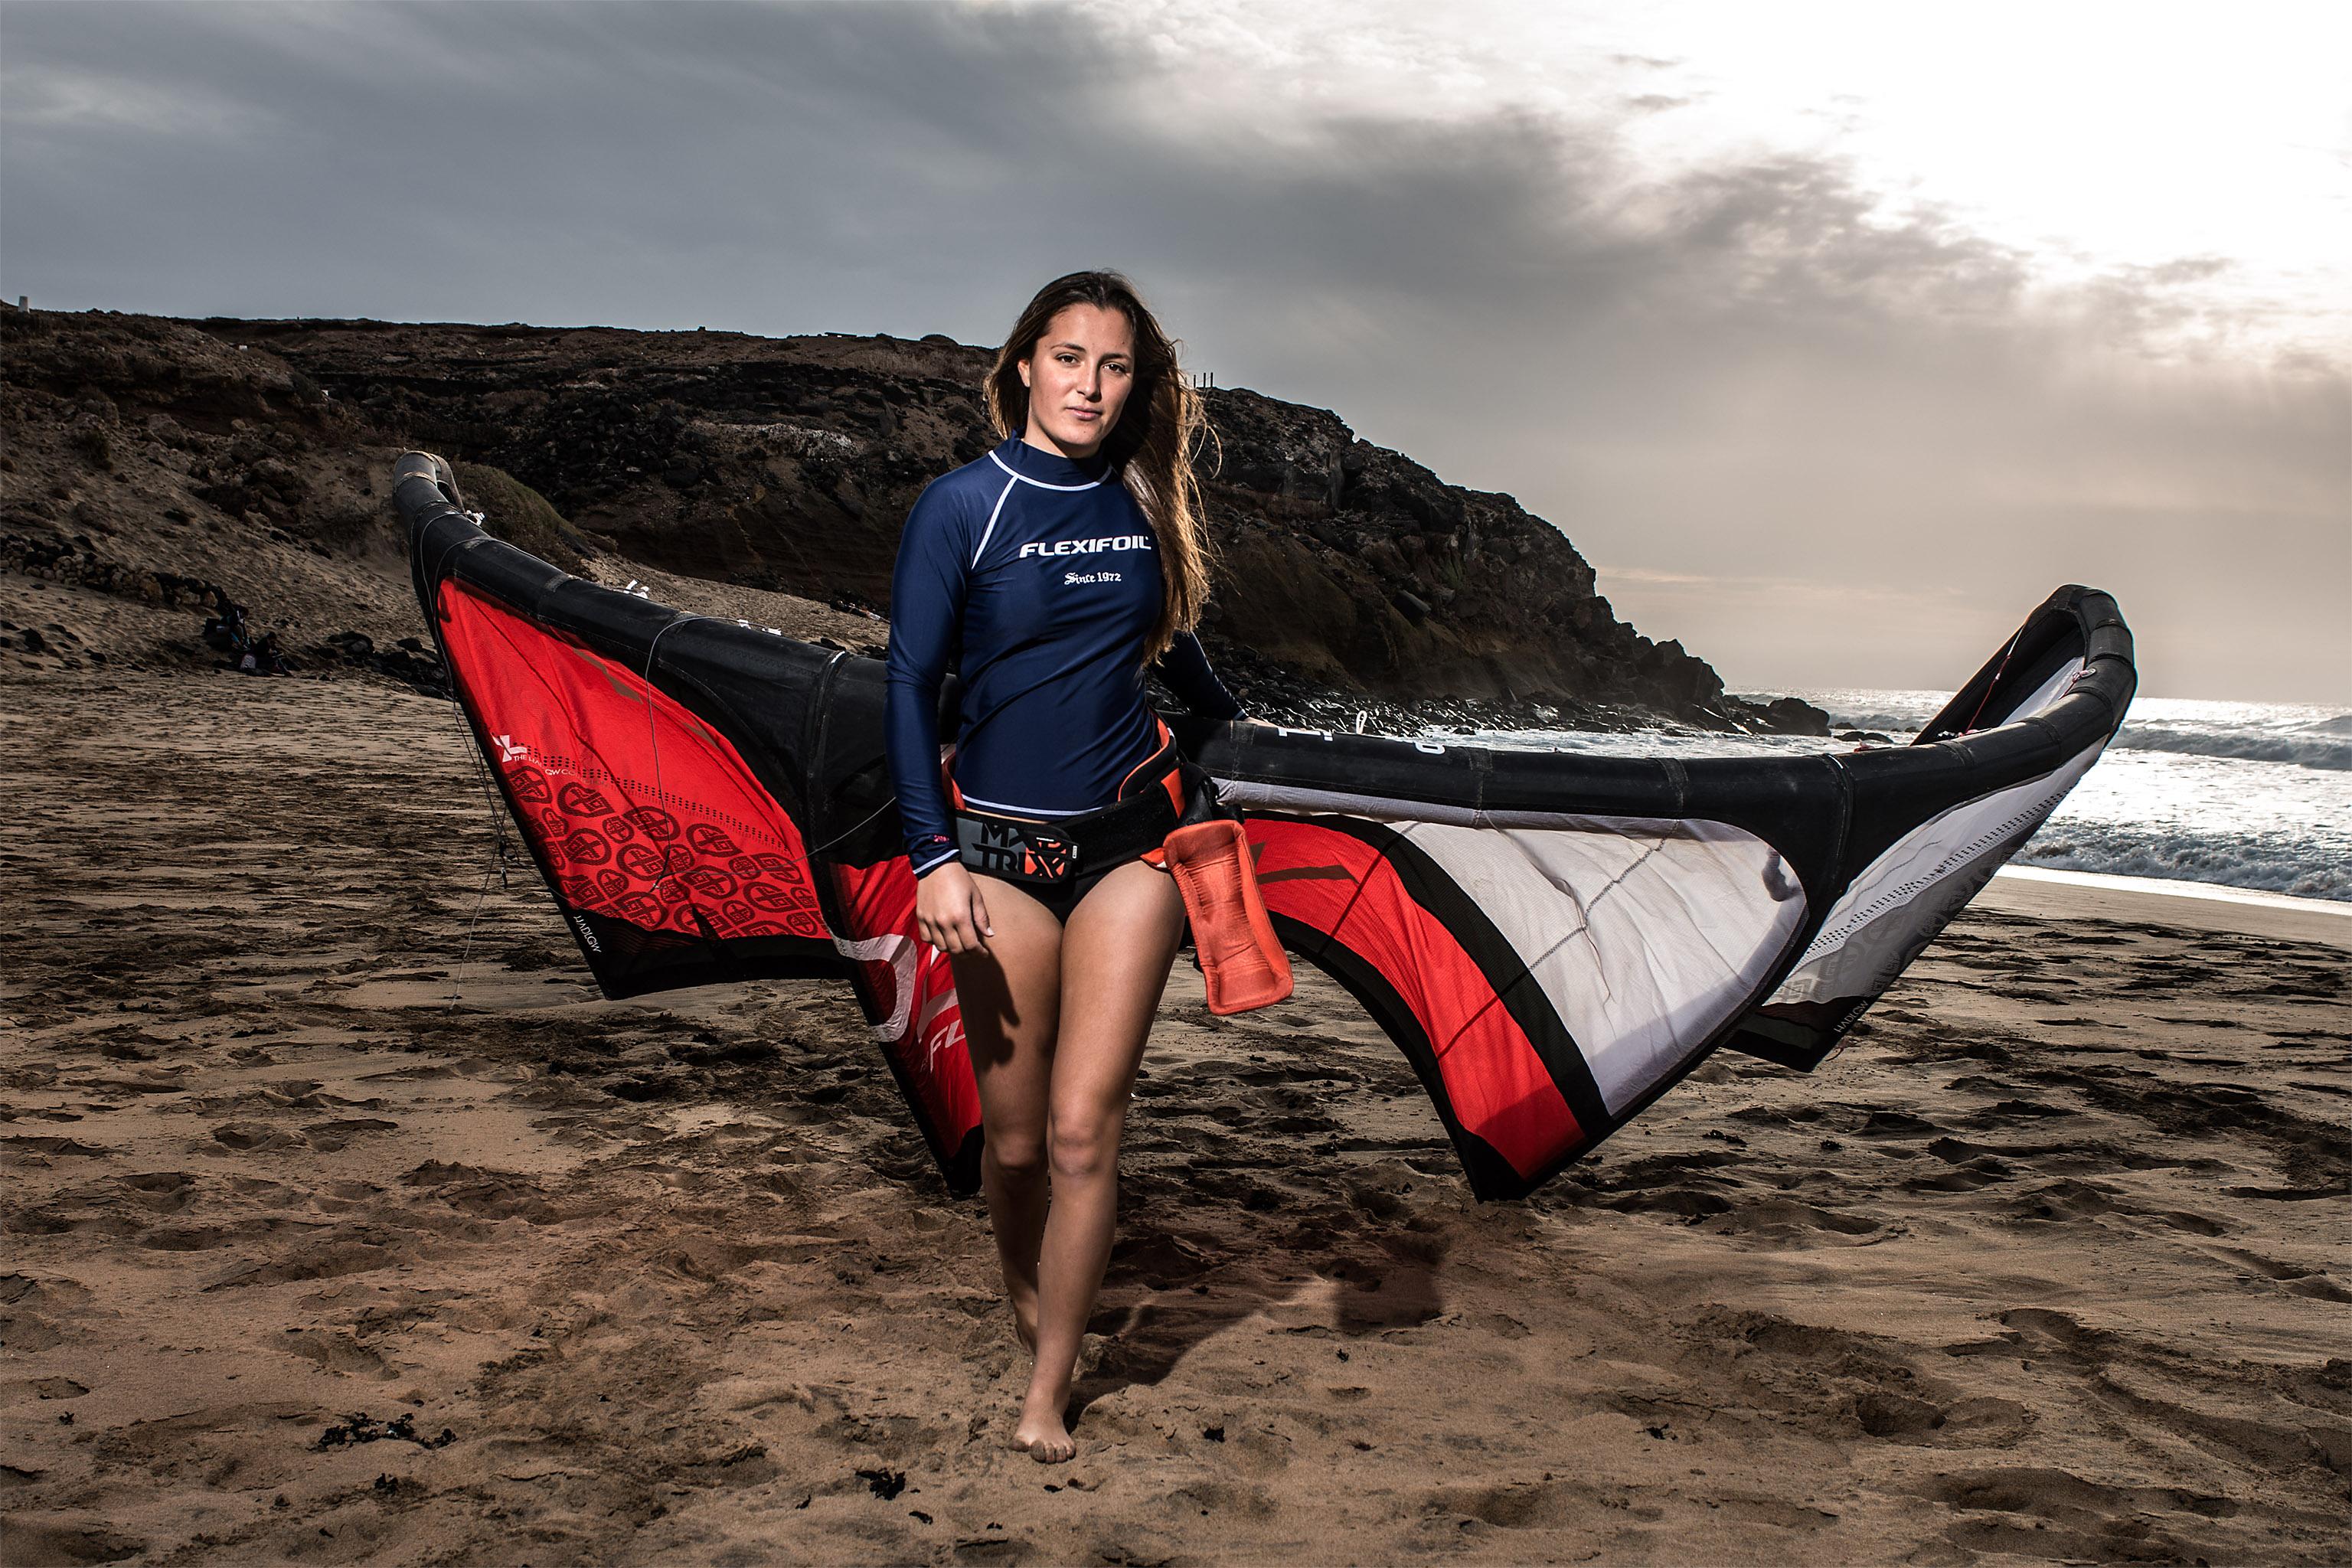 kitesurf wallpaper image - Julia Castro Christiansen and her Flexifoil kite - kitesurfer - in resolution: Original 3072 X 2048